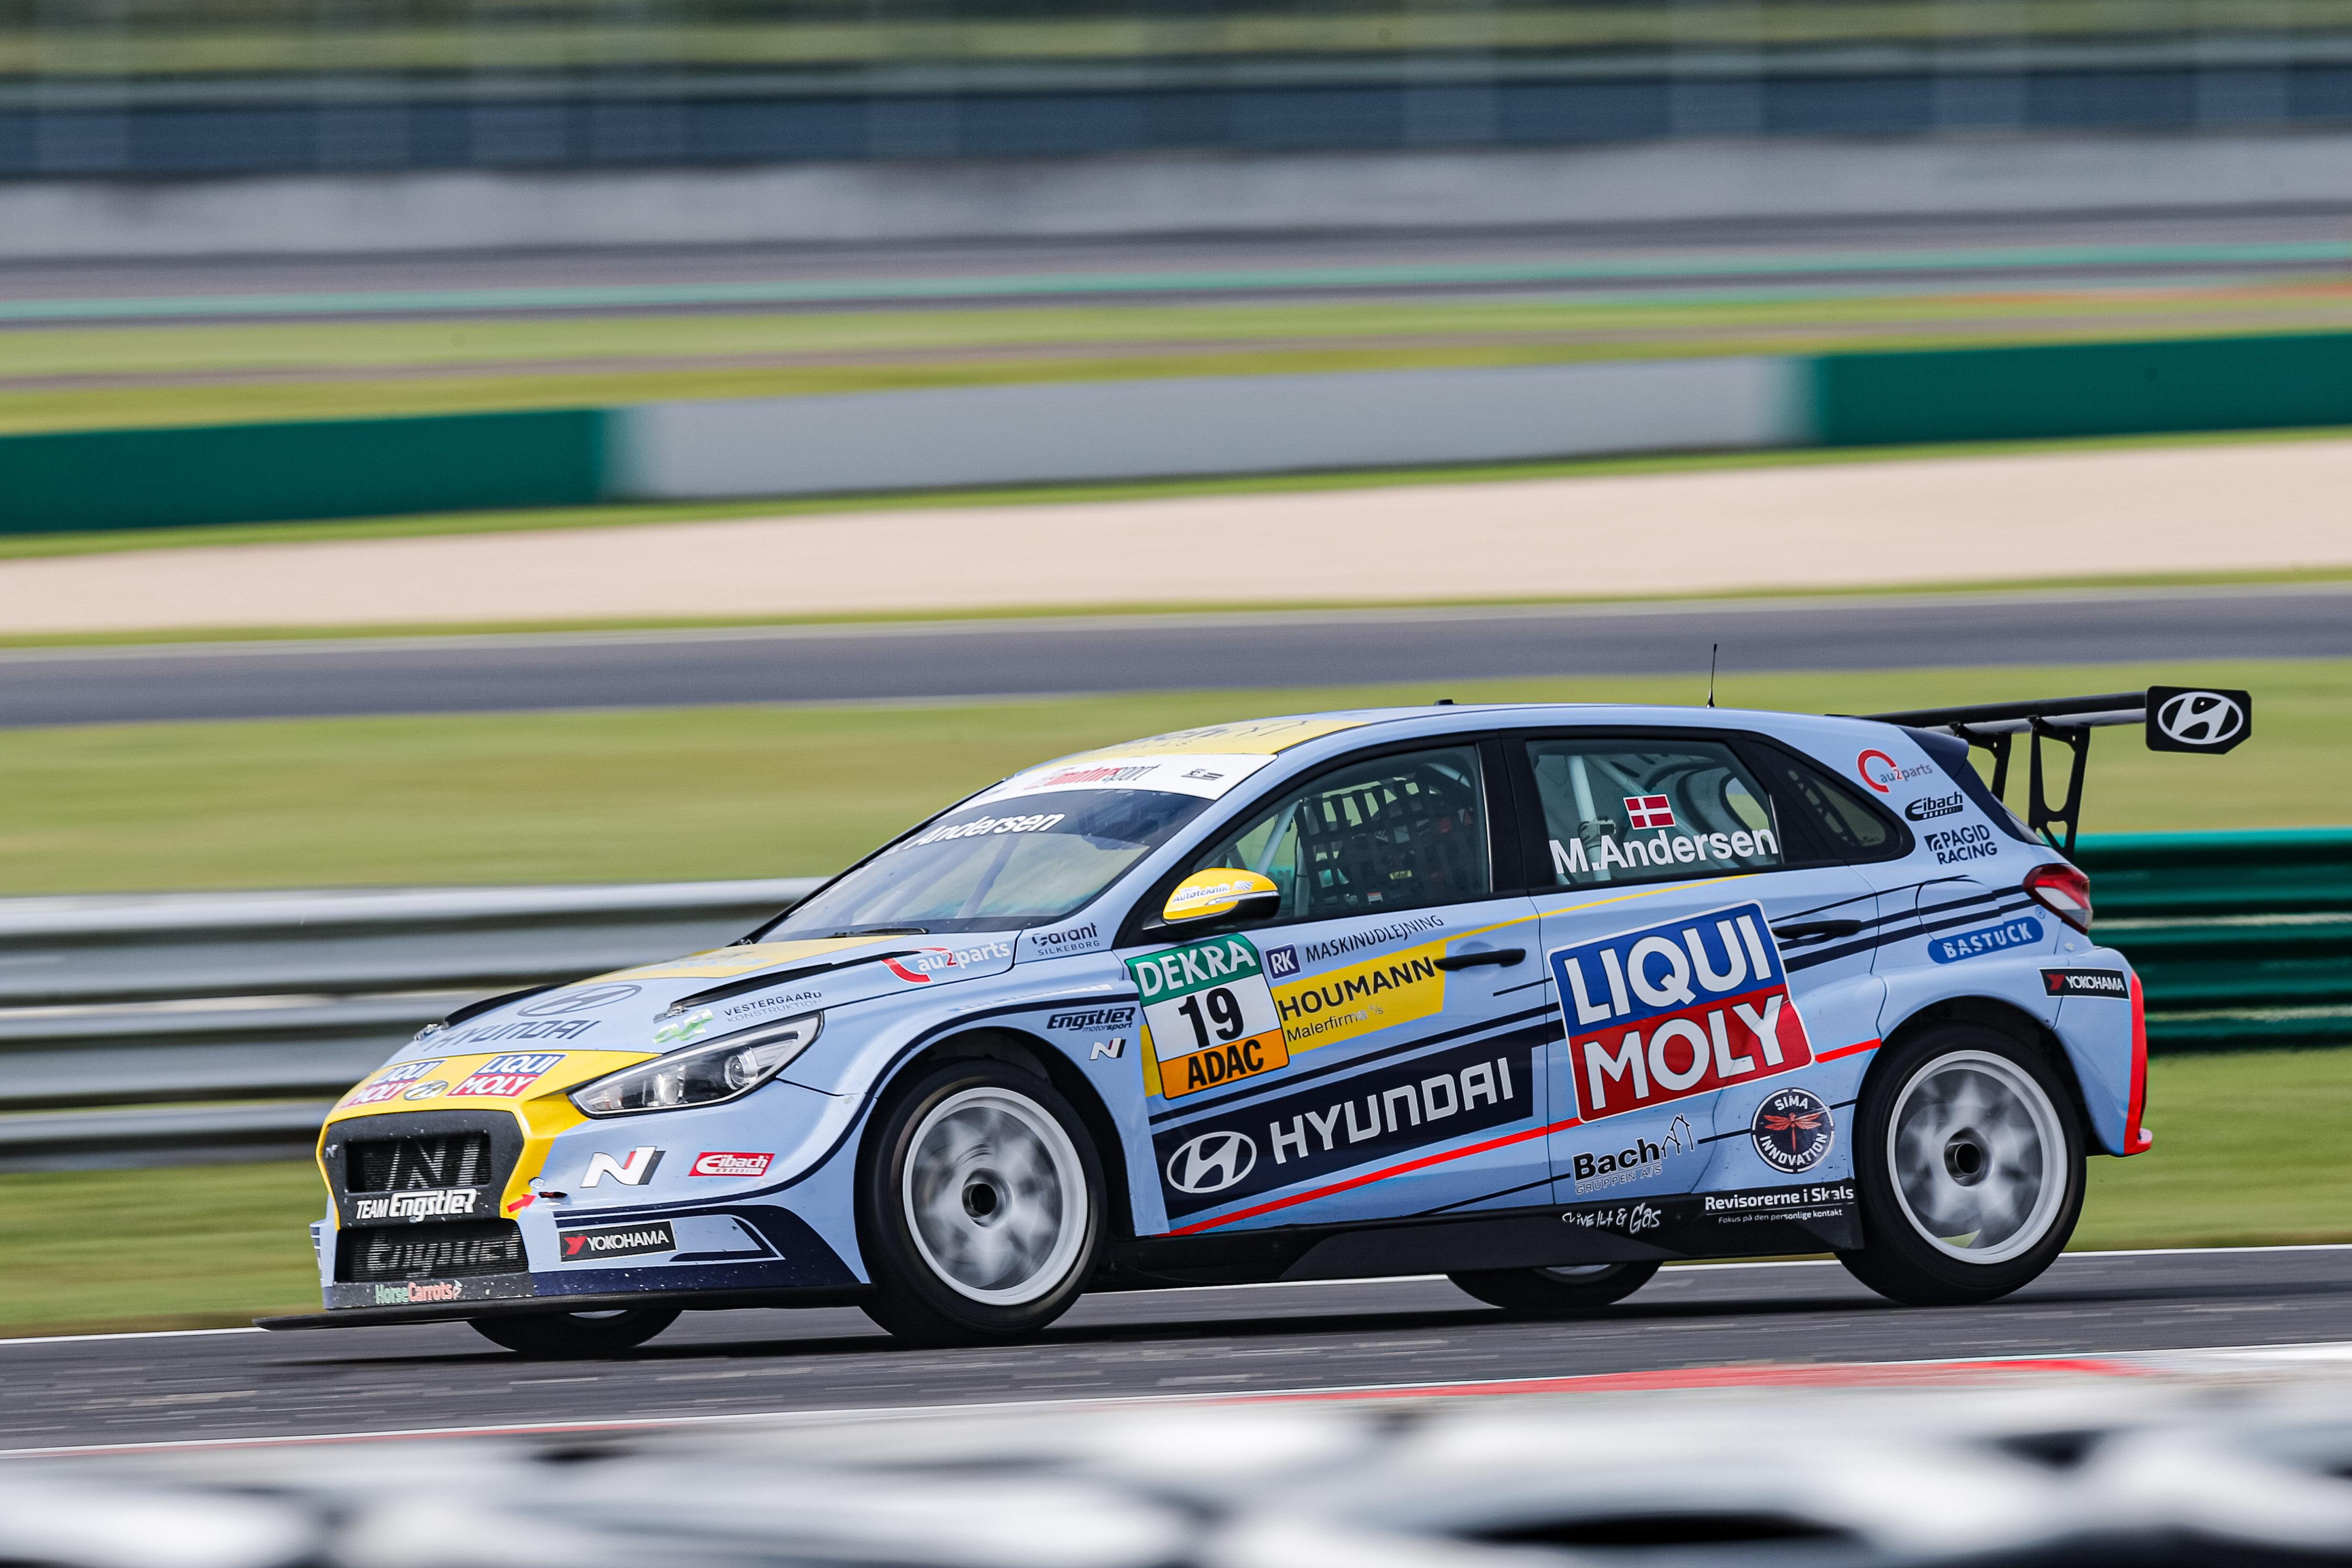 Martin Andersen - TCR Germany - Lausitzring